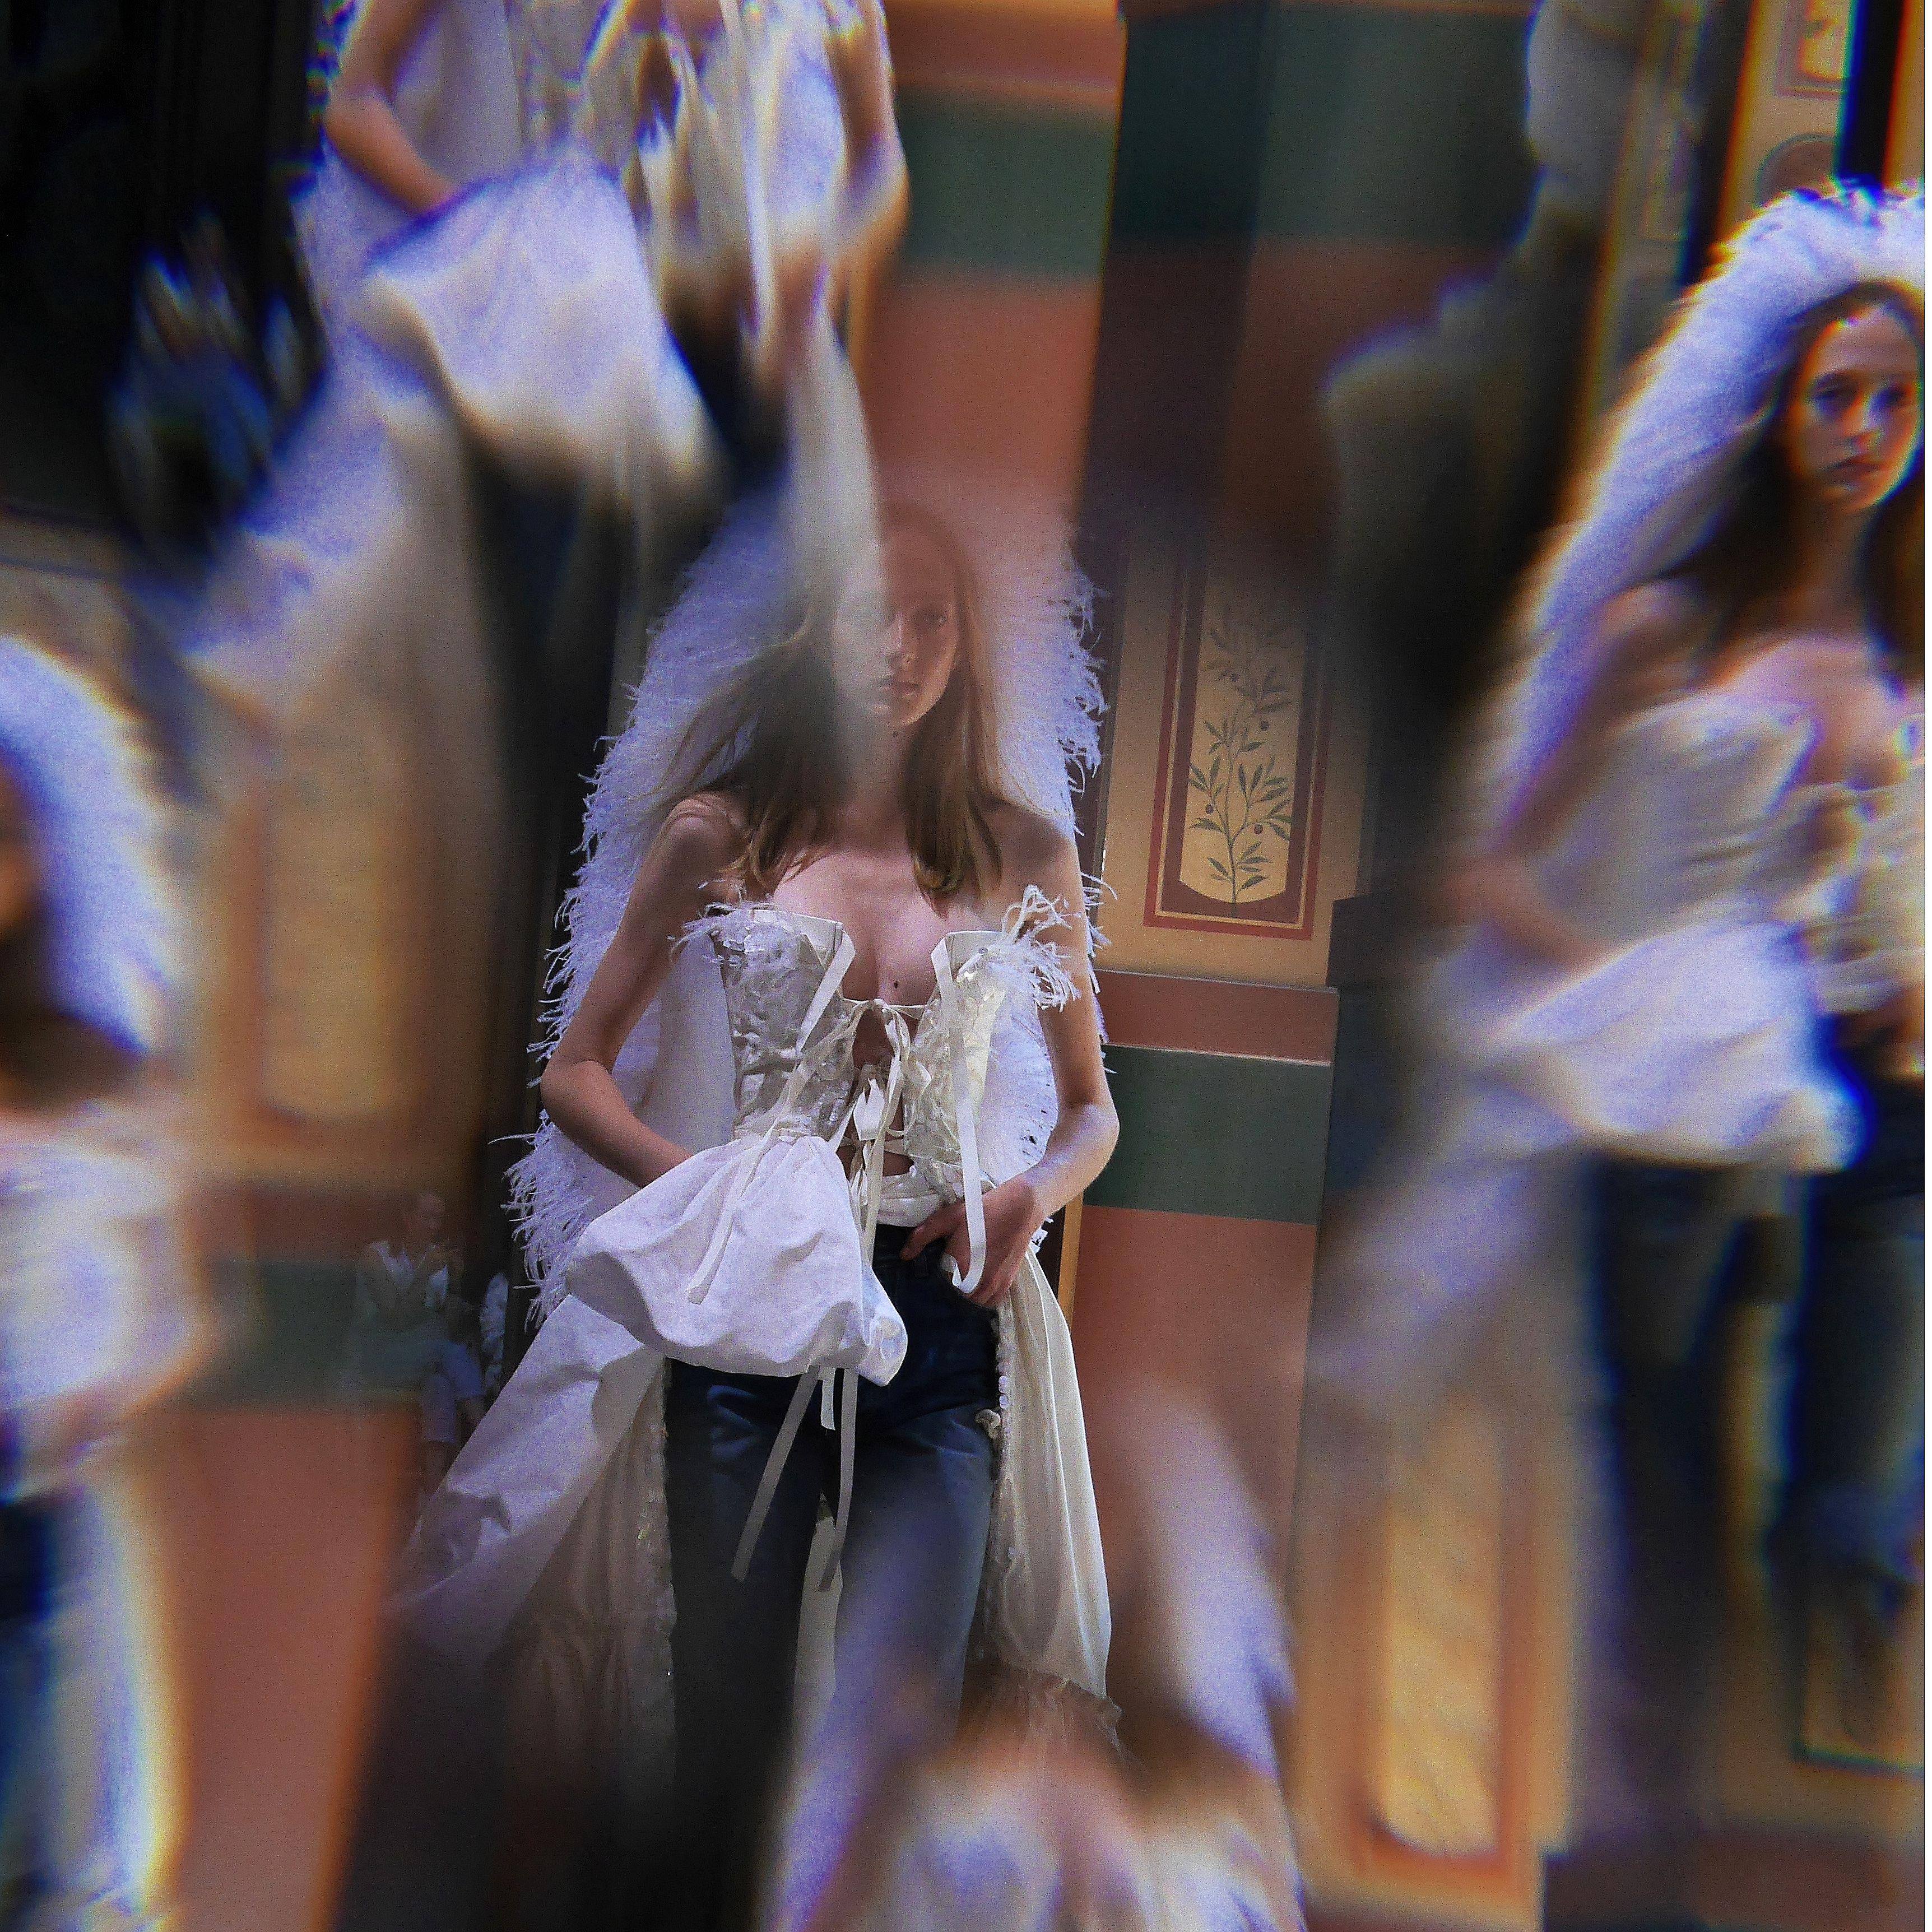 Frank_Perrin_Rykiel_Atelier_2018_1560465-Exposure